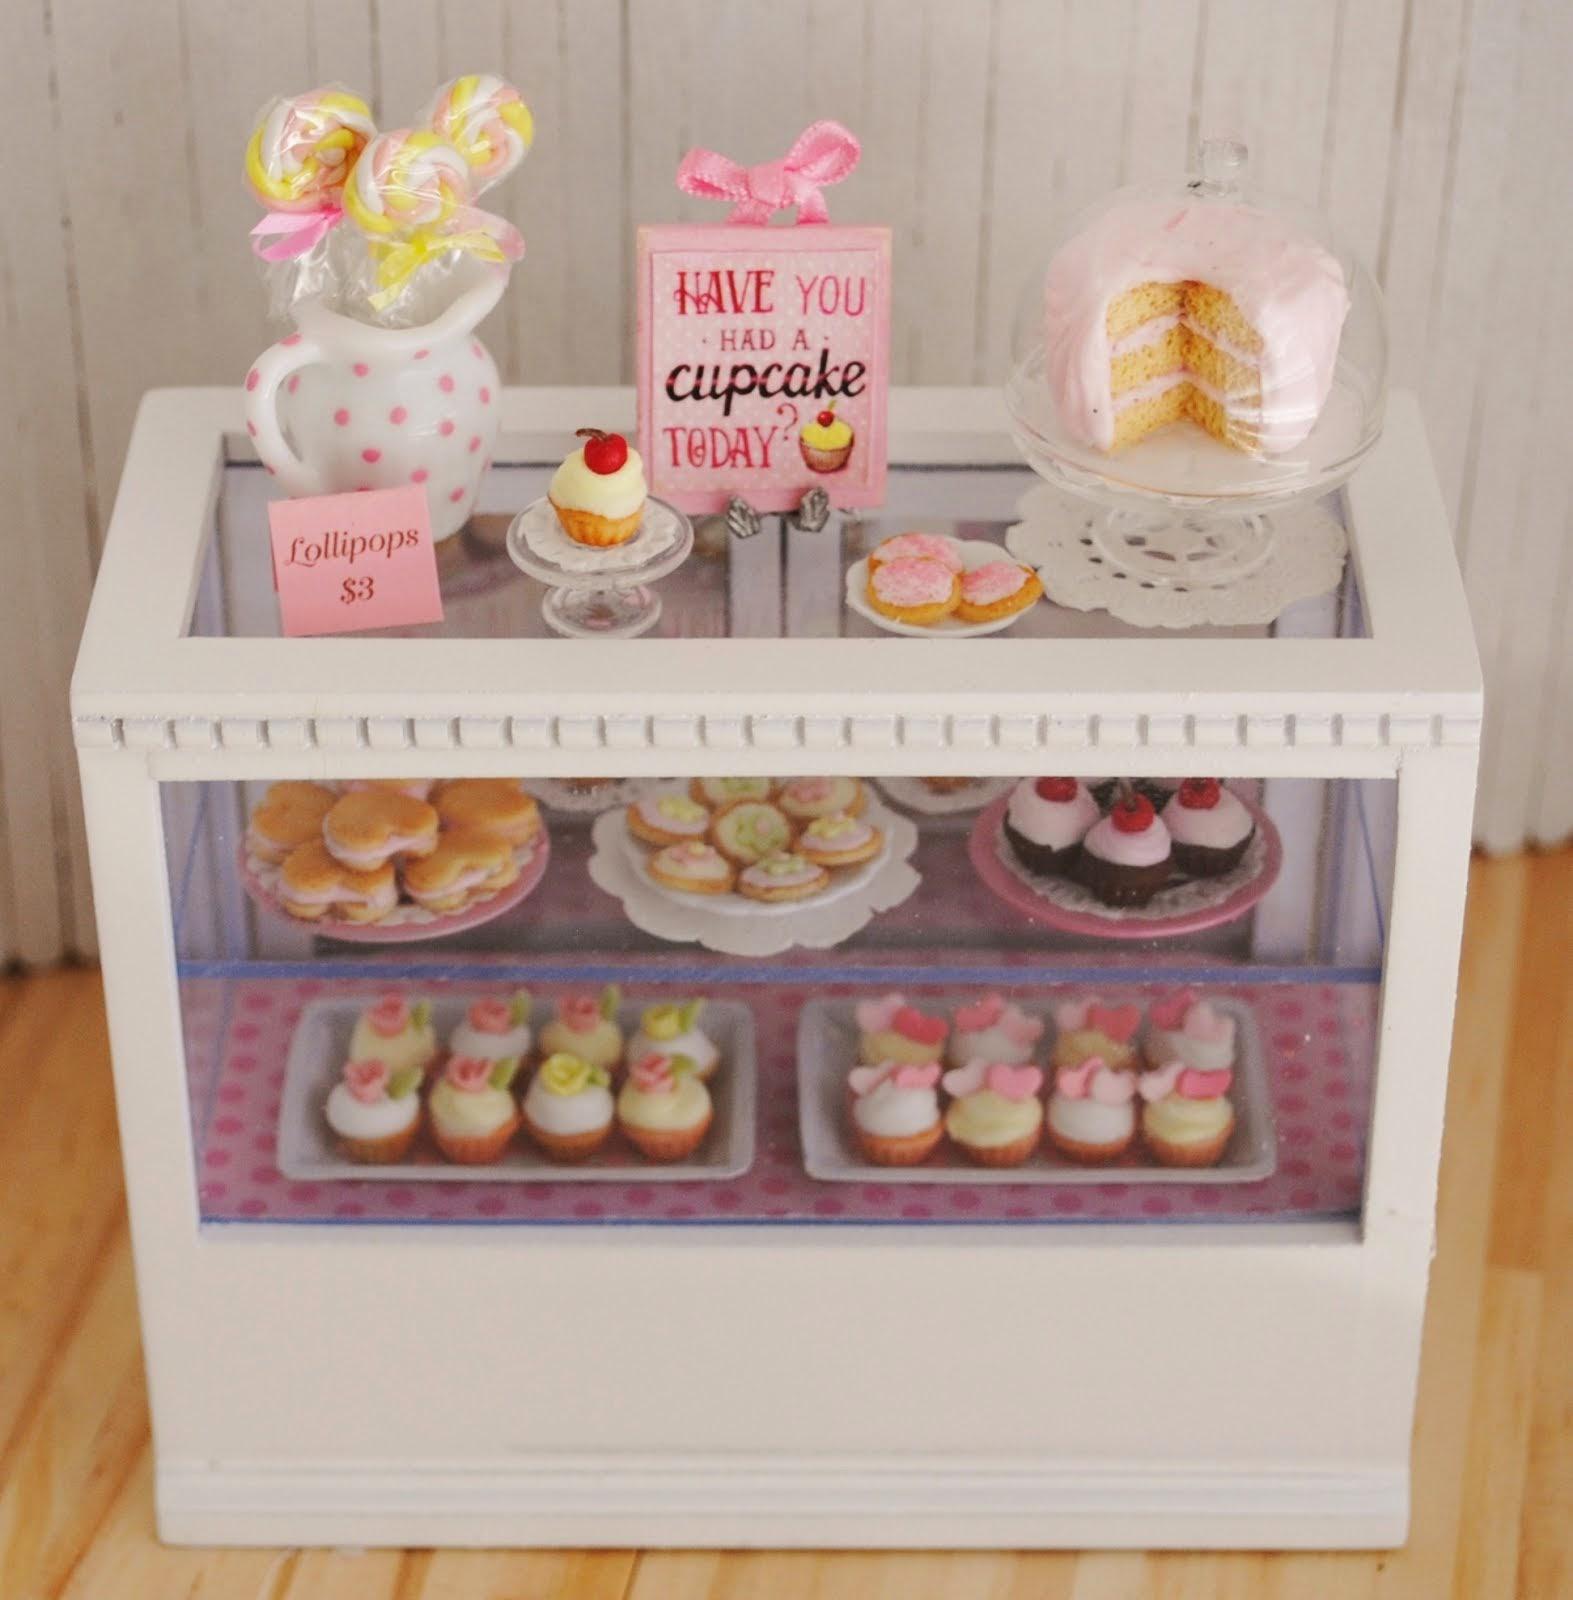 Need A Cupcake?